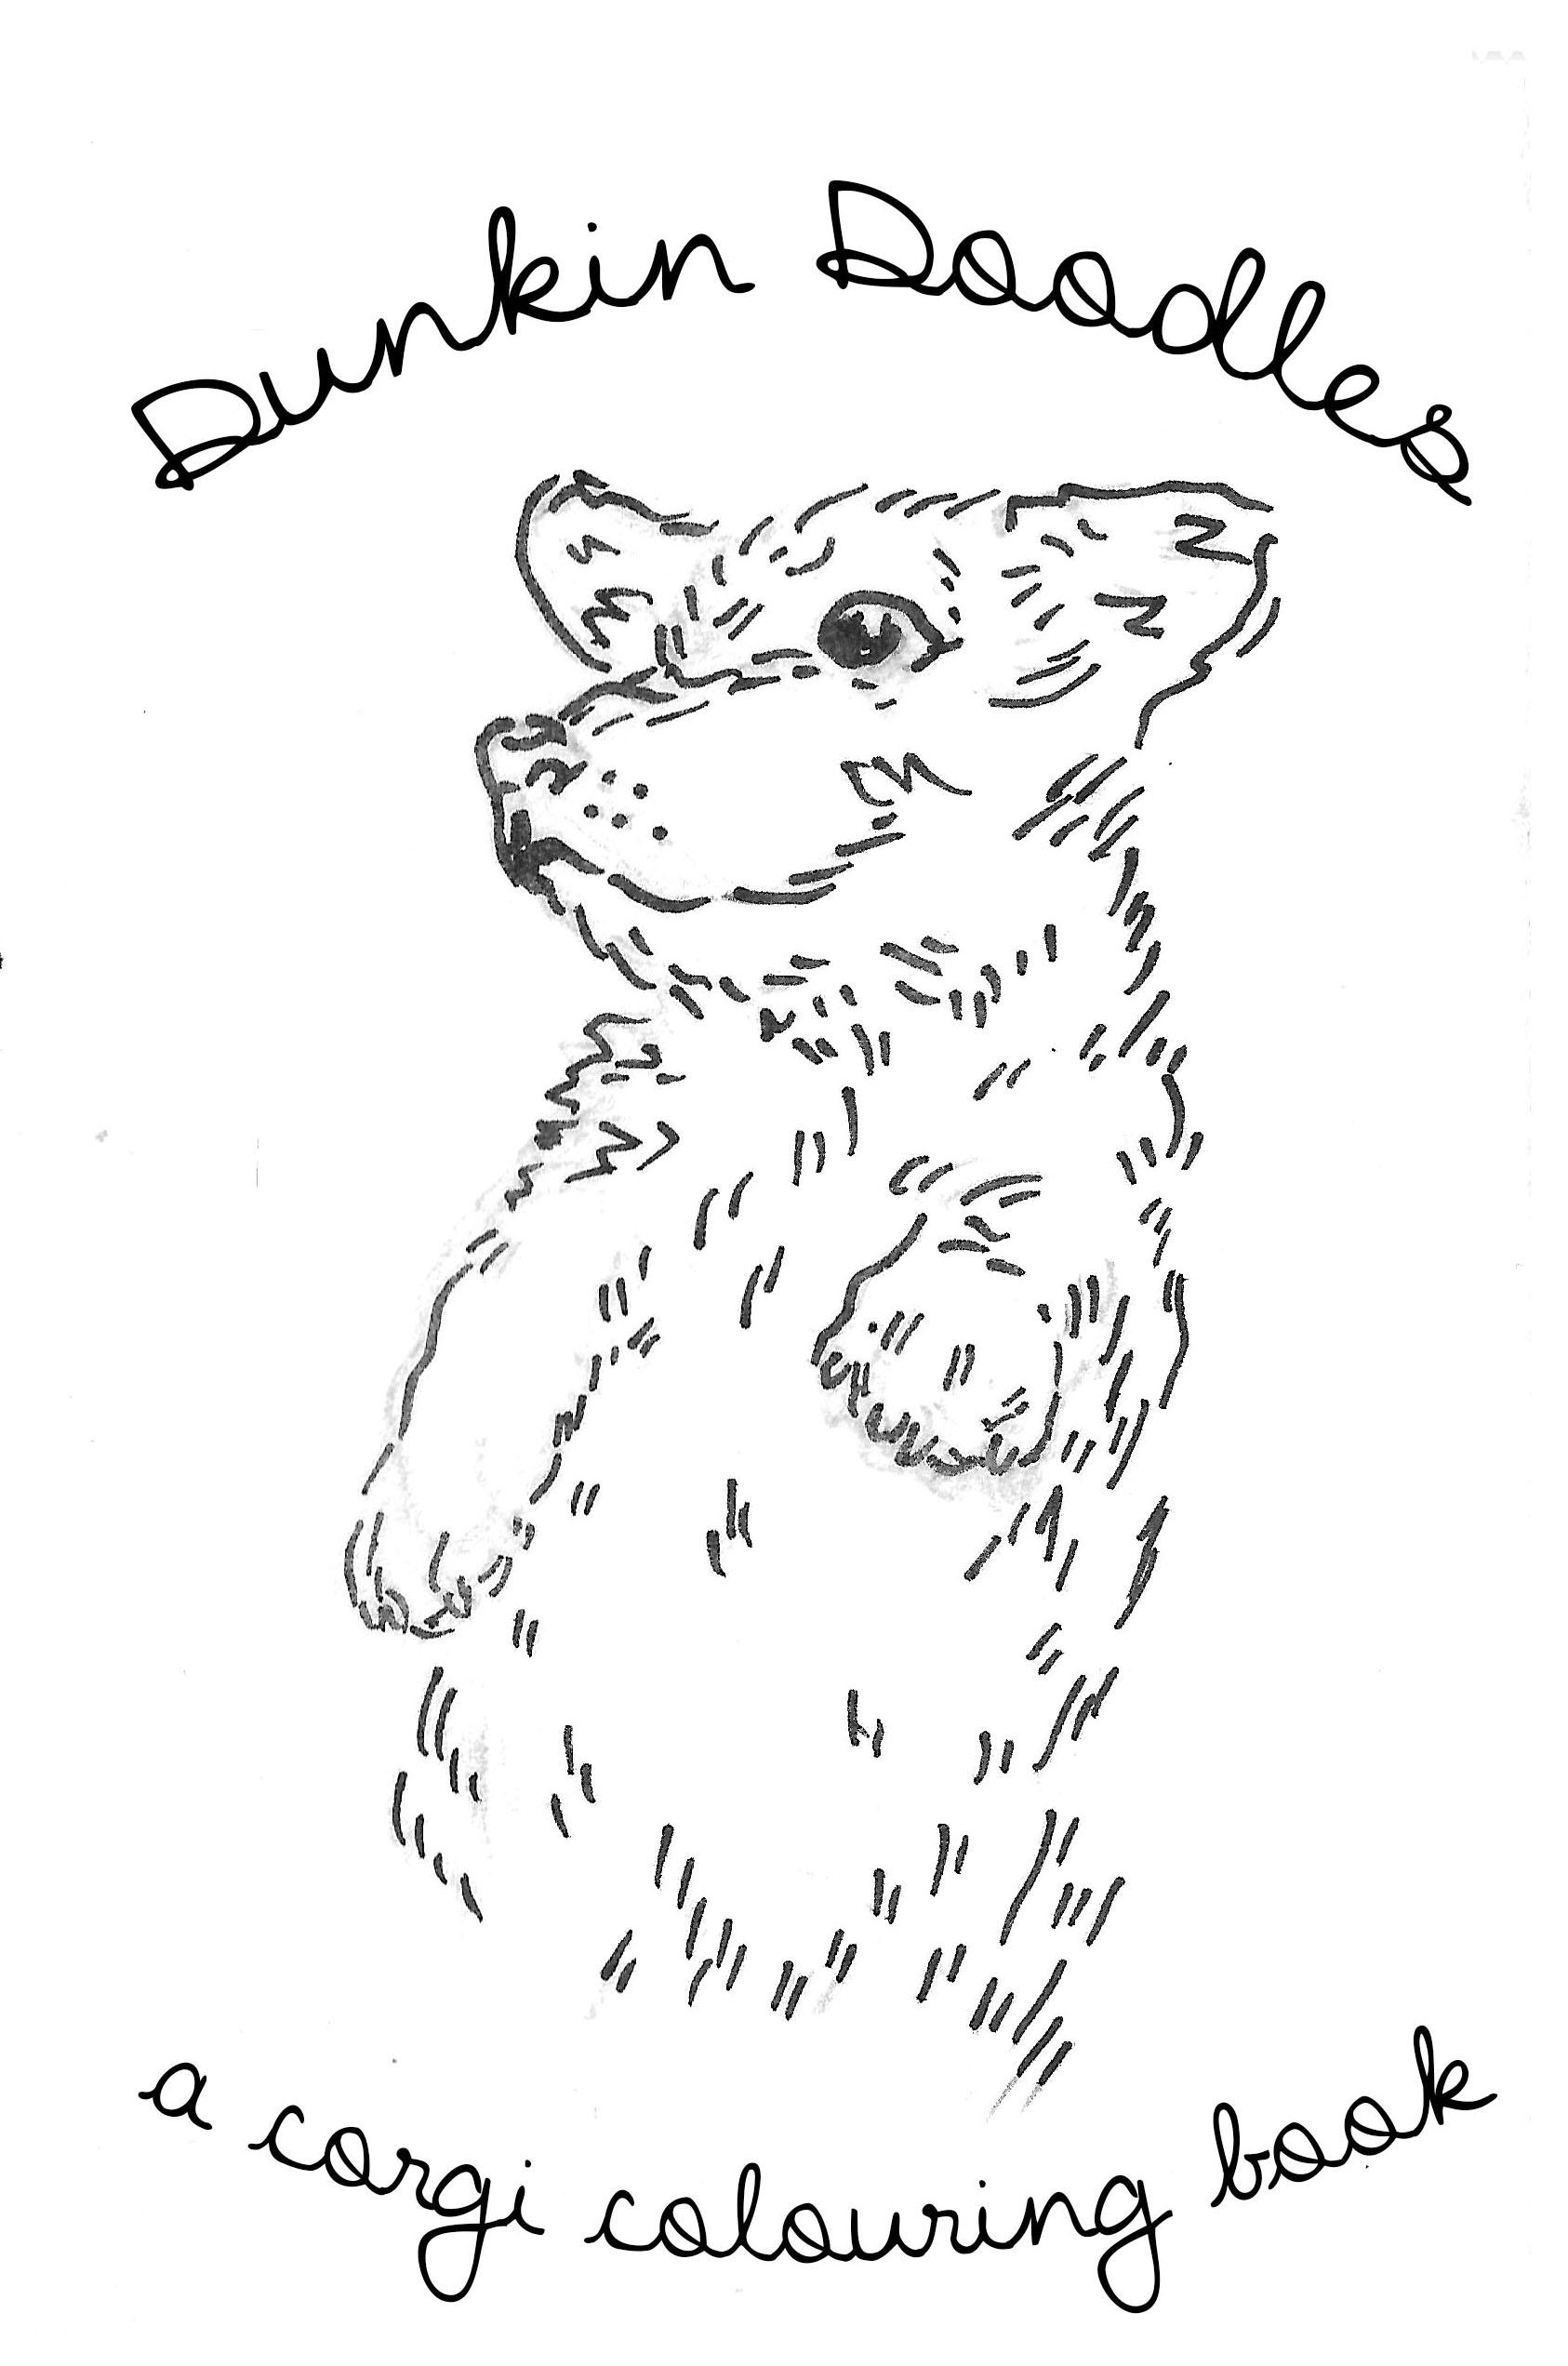 dunkindoodles-zine-cover